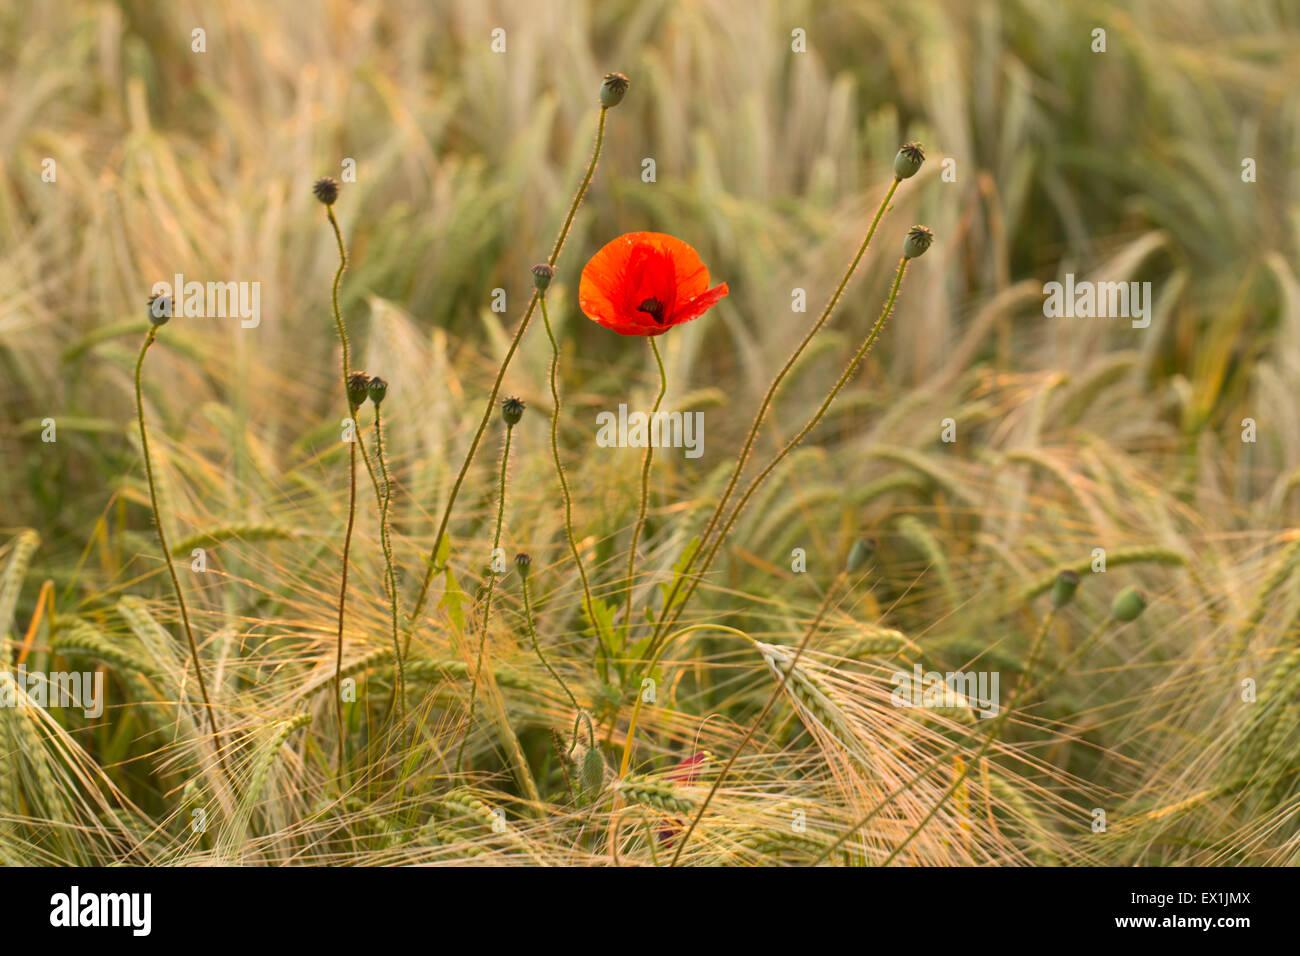 A poppy flower in a field bathed in golden light. - Stock Image